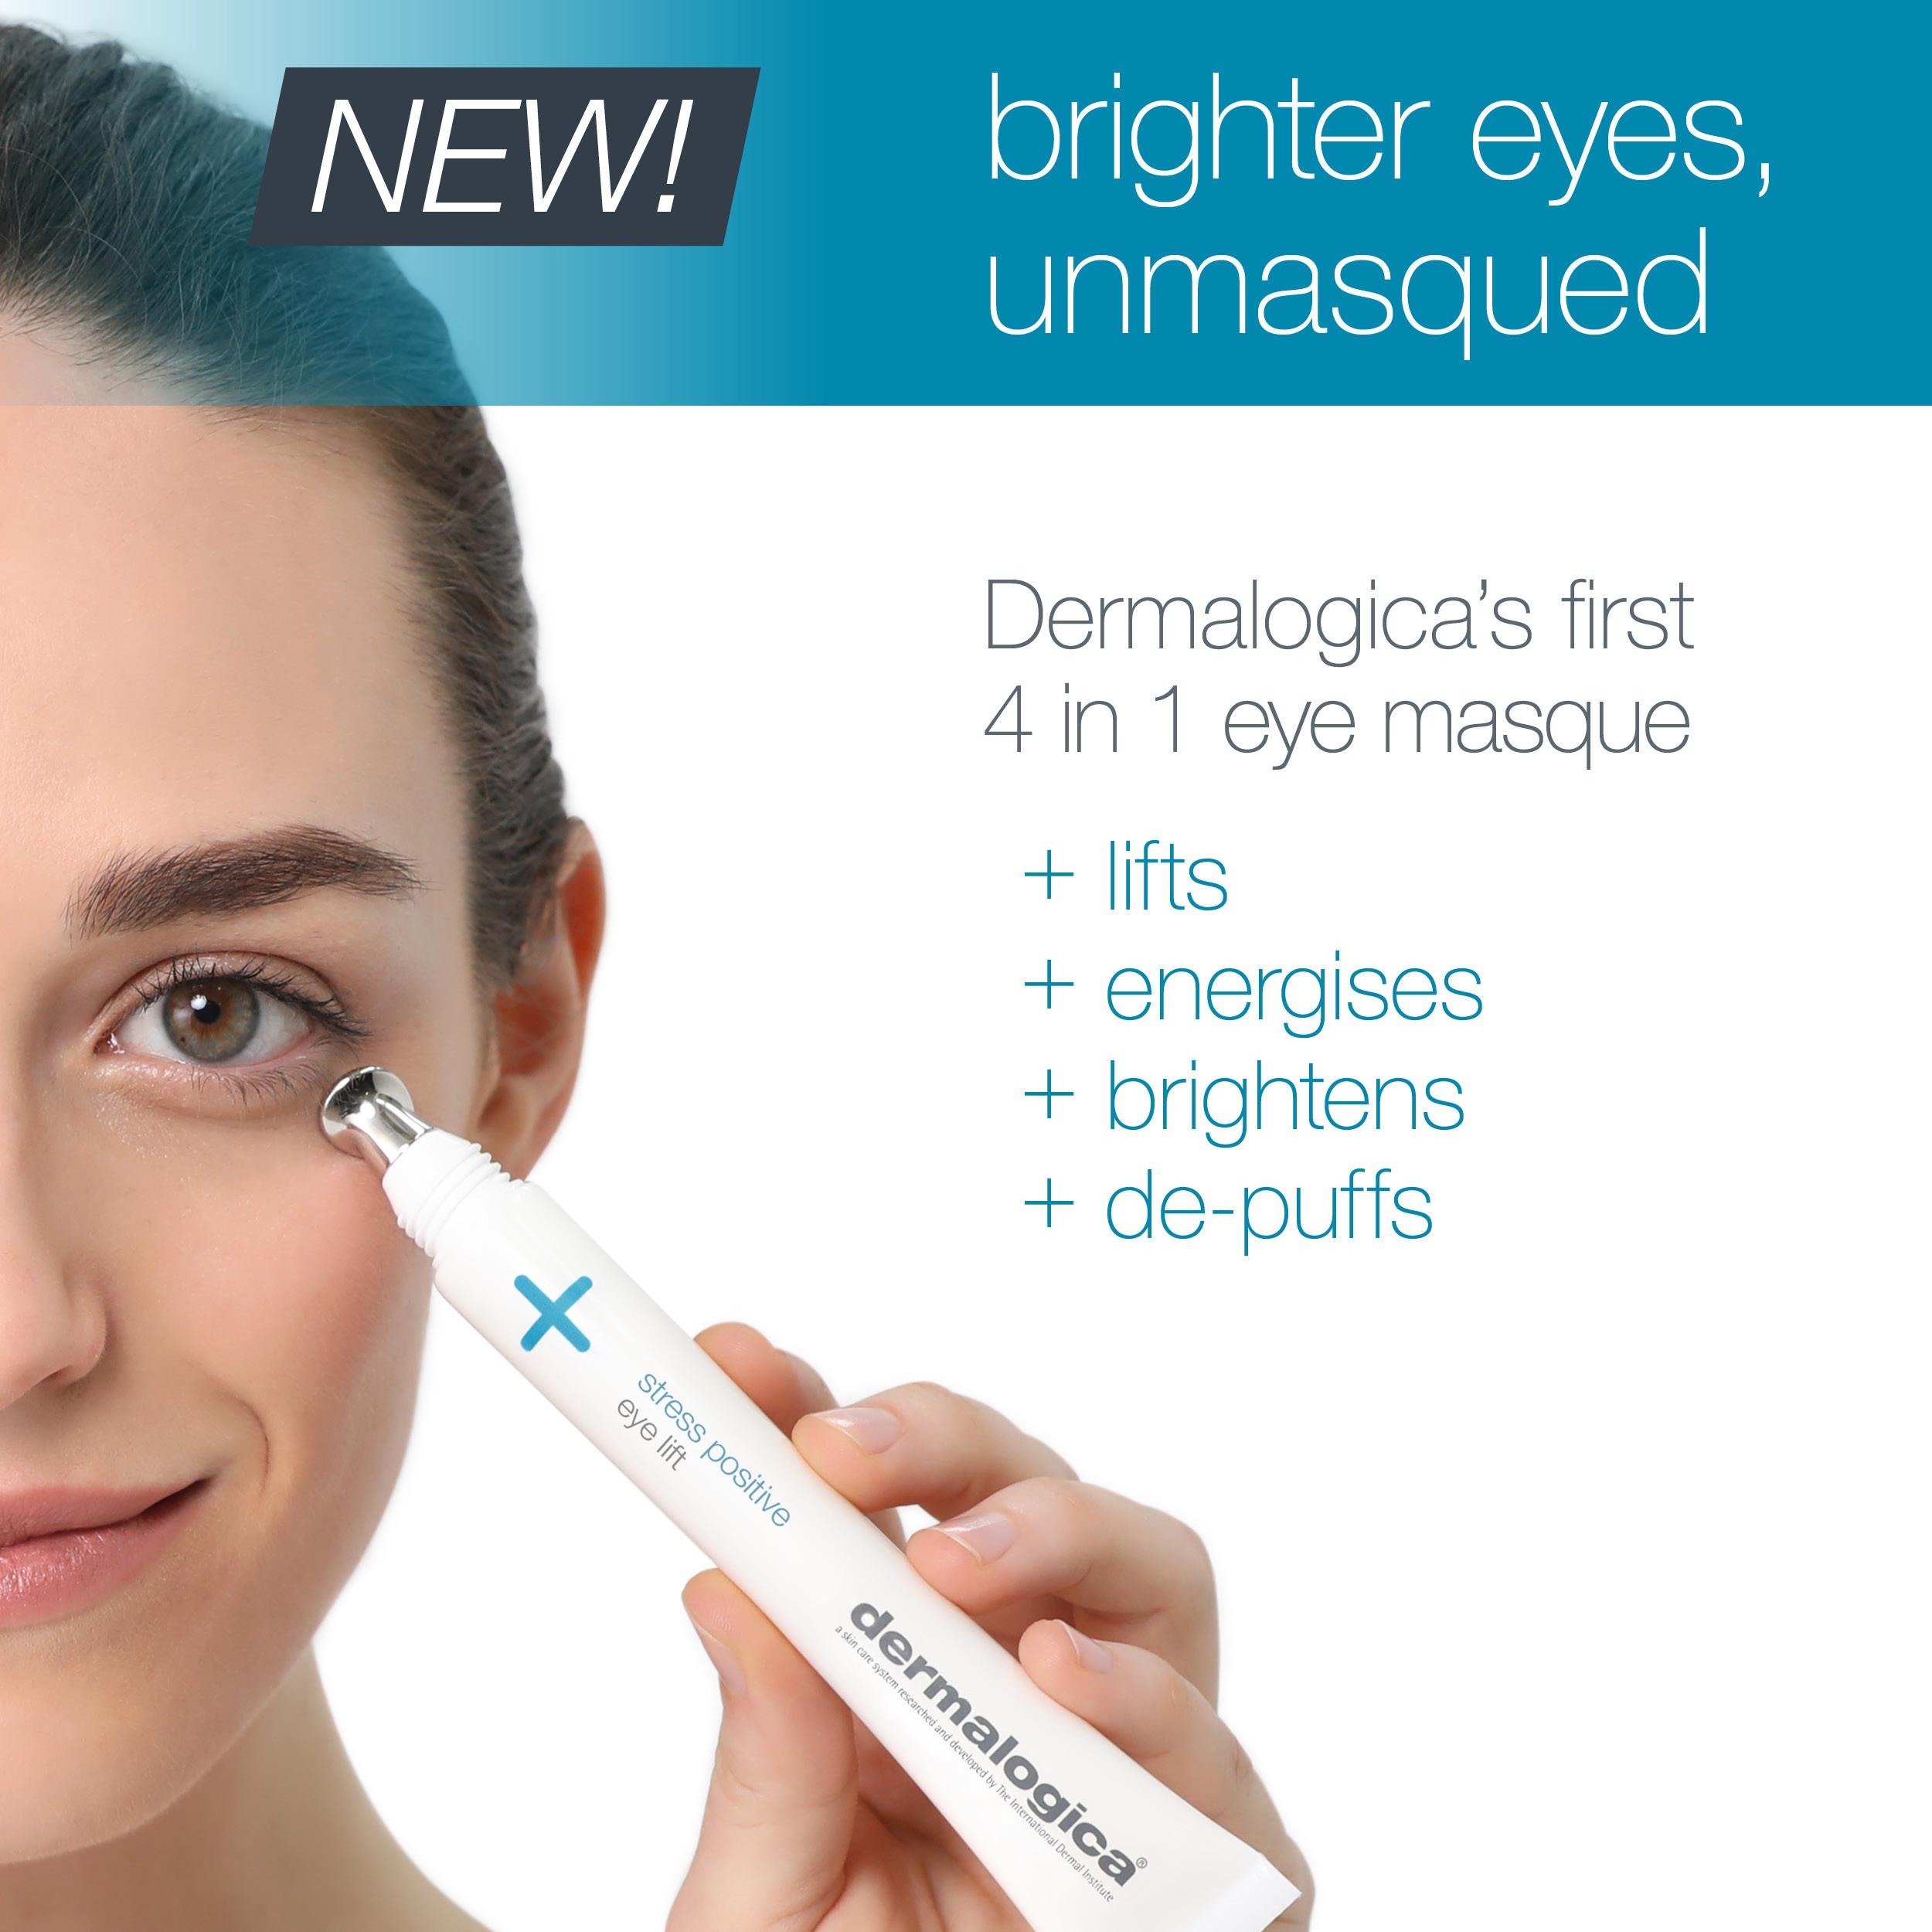 Dermalogica Stress Positive Eye Lift treatment flyer